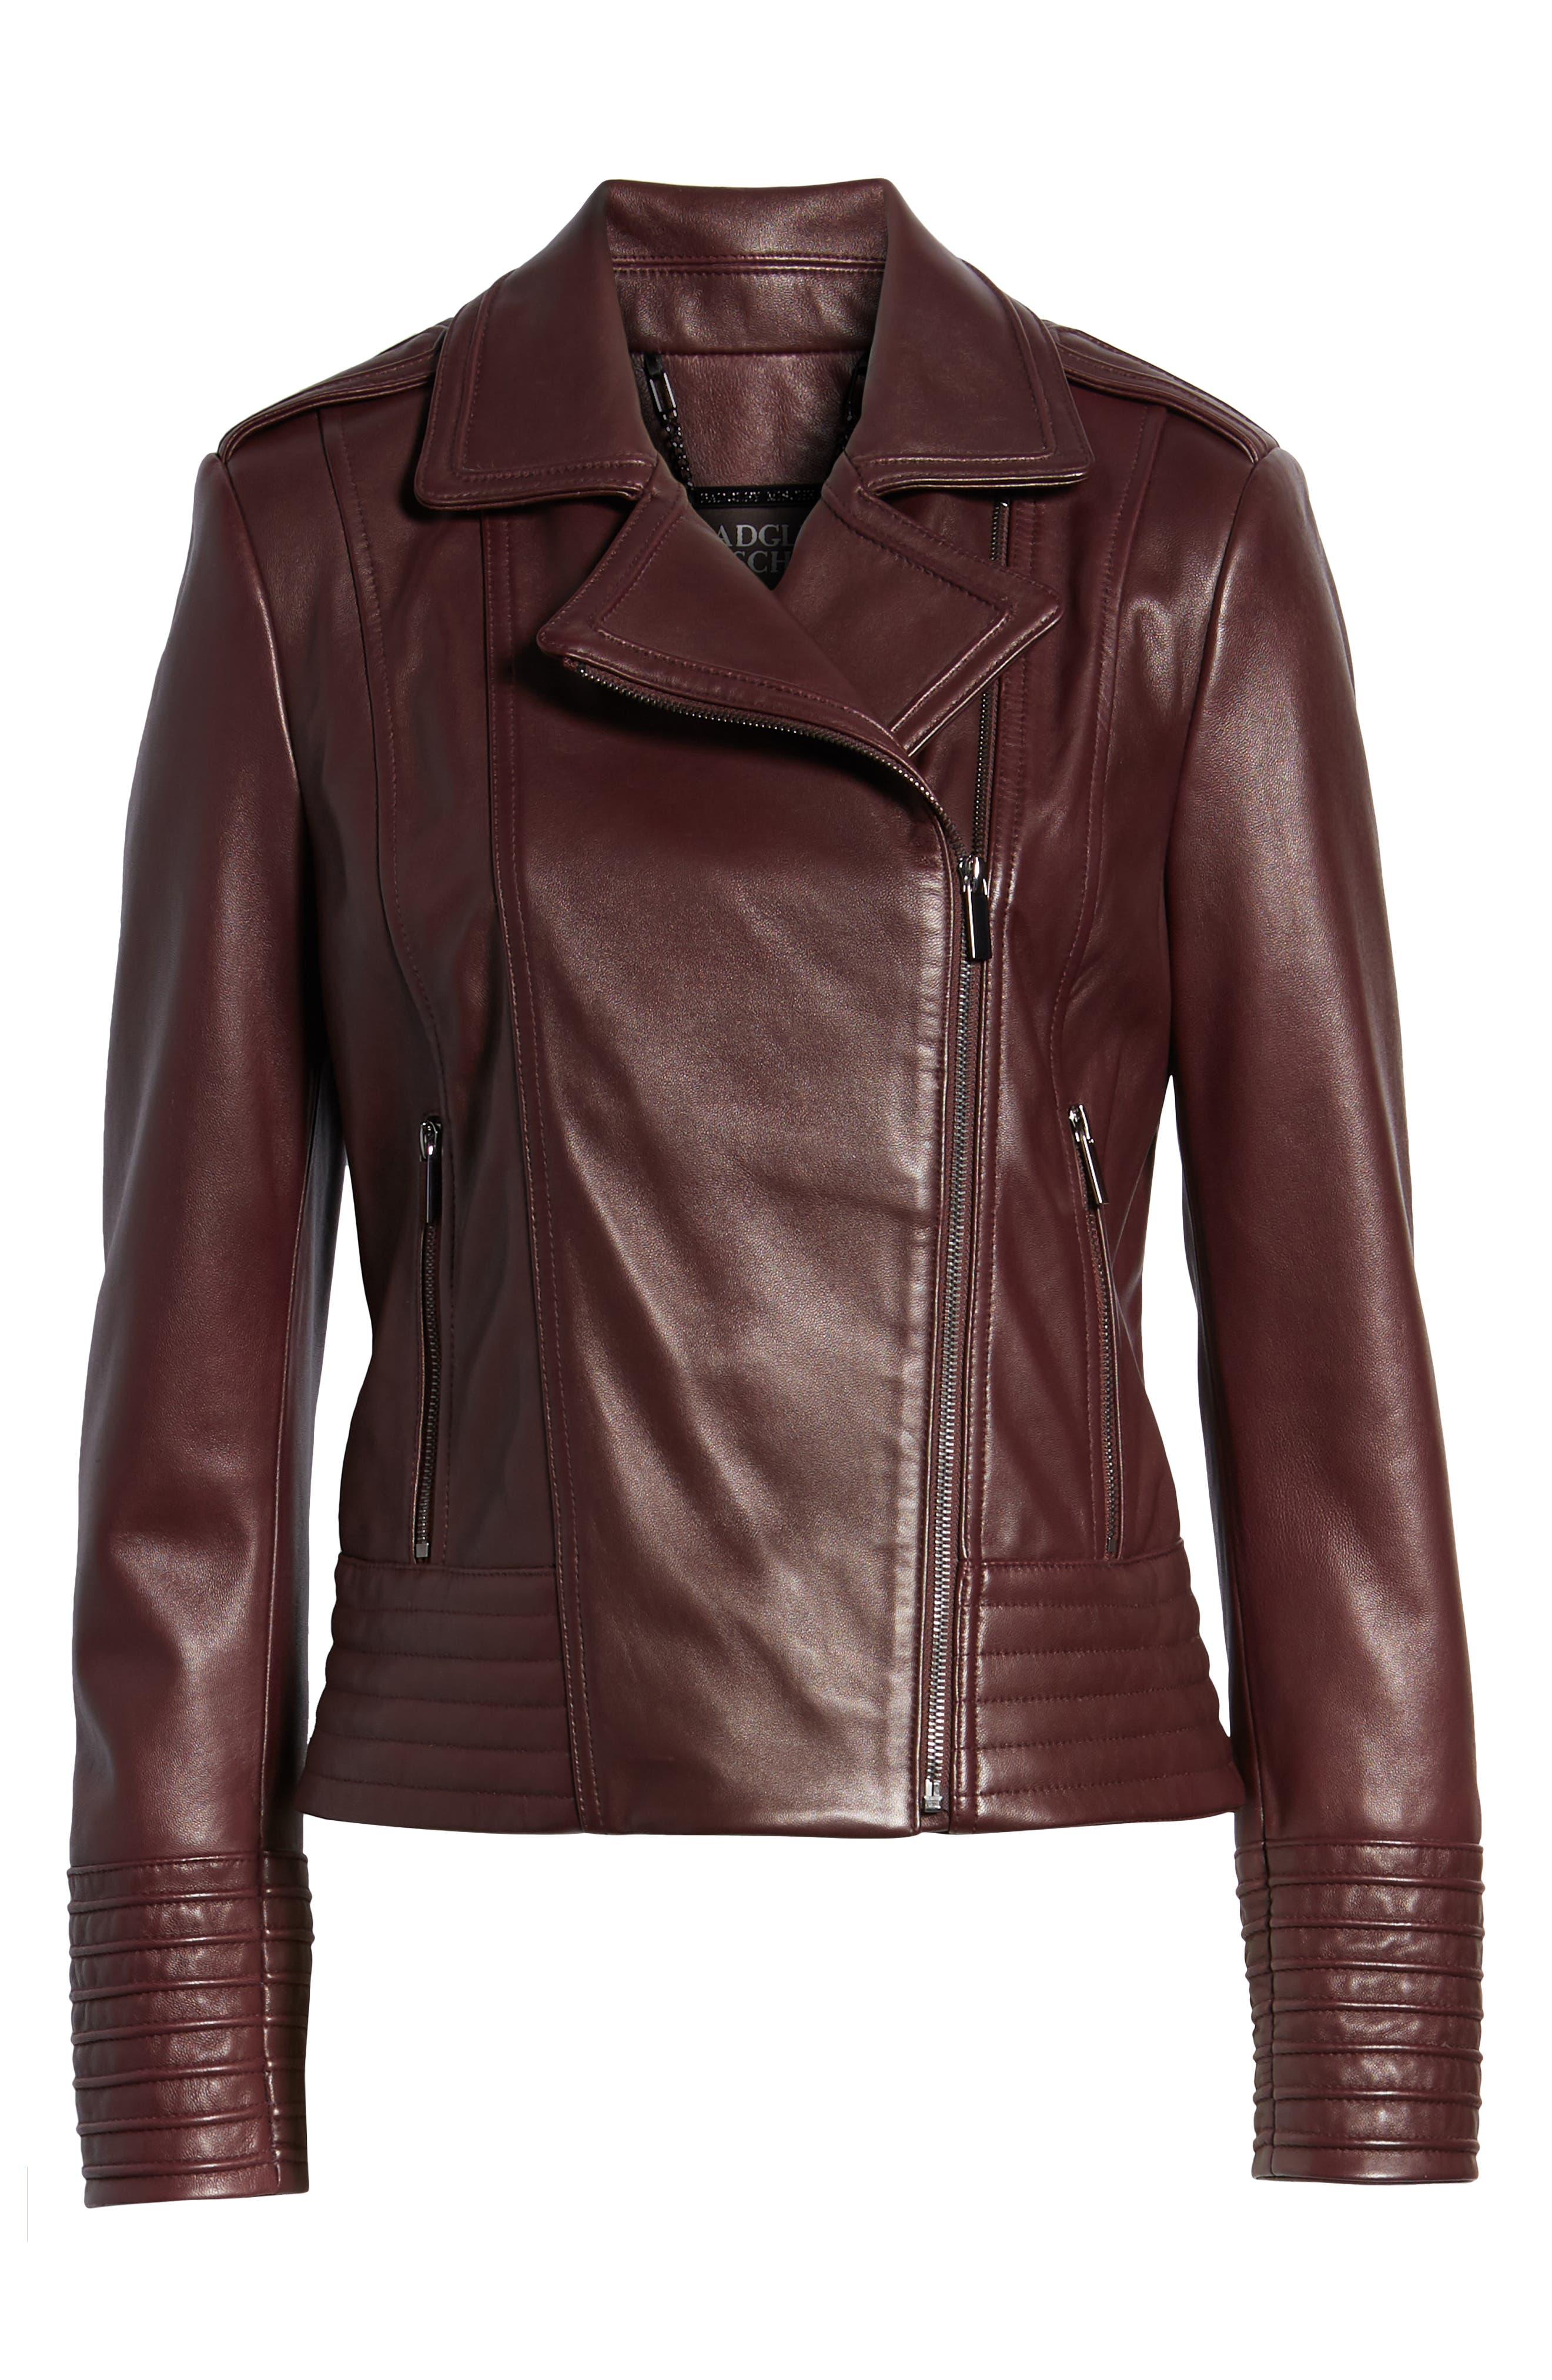 Gia Leather Biker Jacket,                             Alternate thumbnail 6, color,                             Burgundy